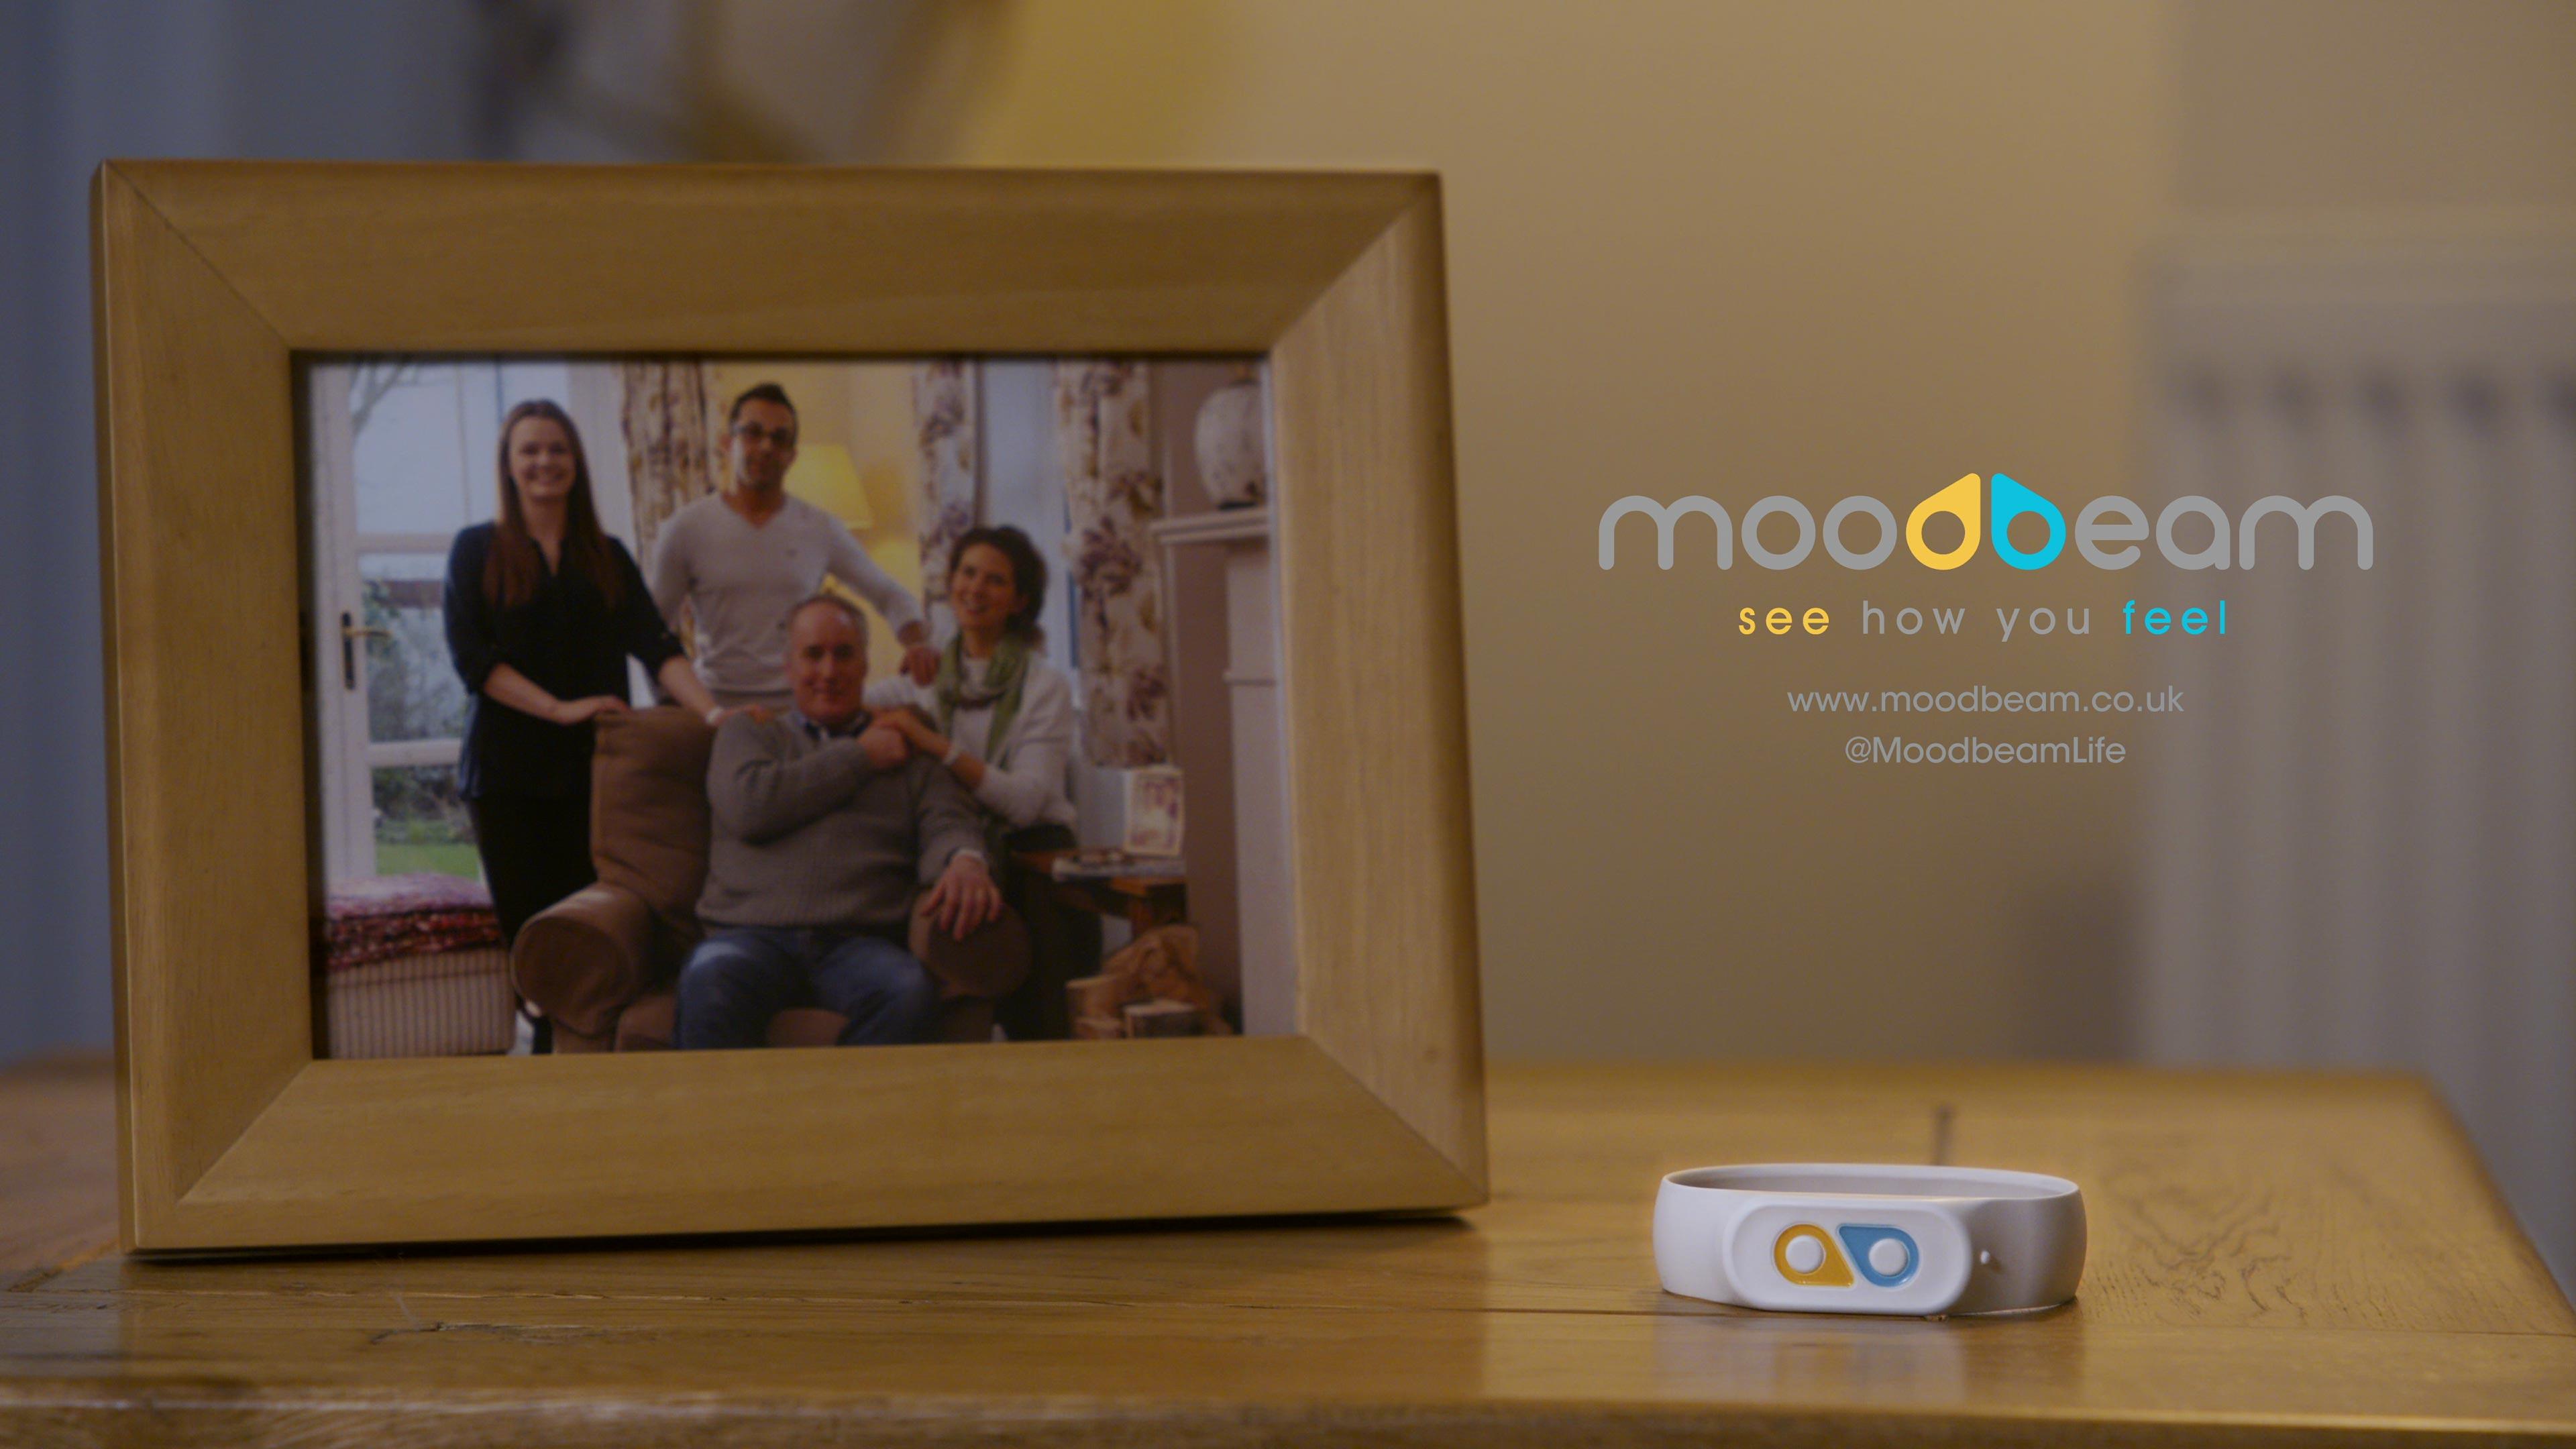 Moodbeam Video Content